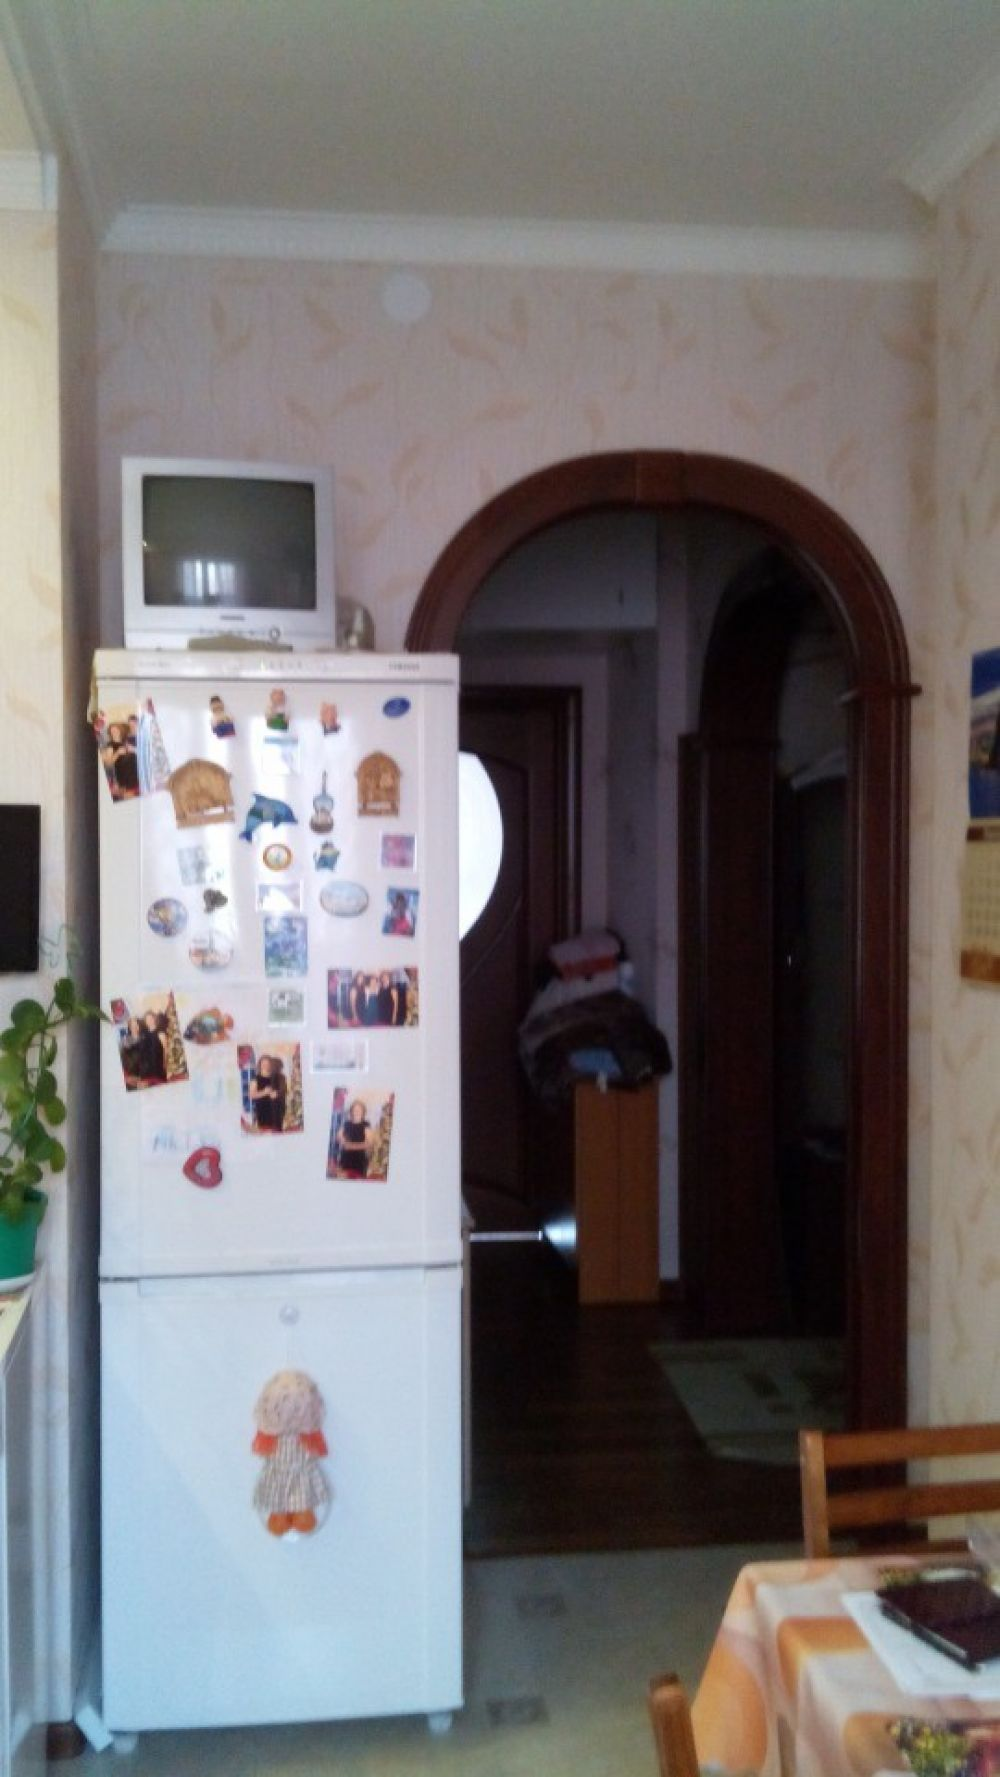 2-к квартира, Щелково, микрорайон Богородский, 6, фото 13